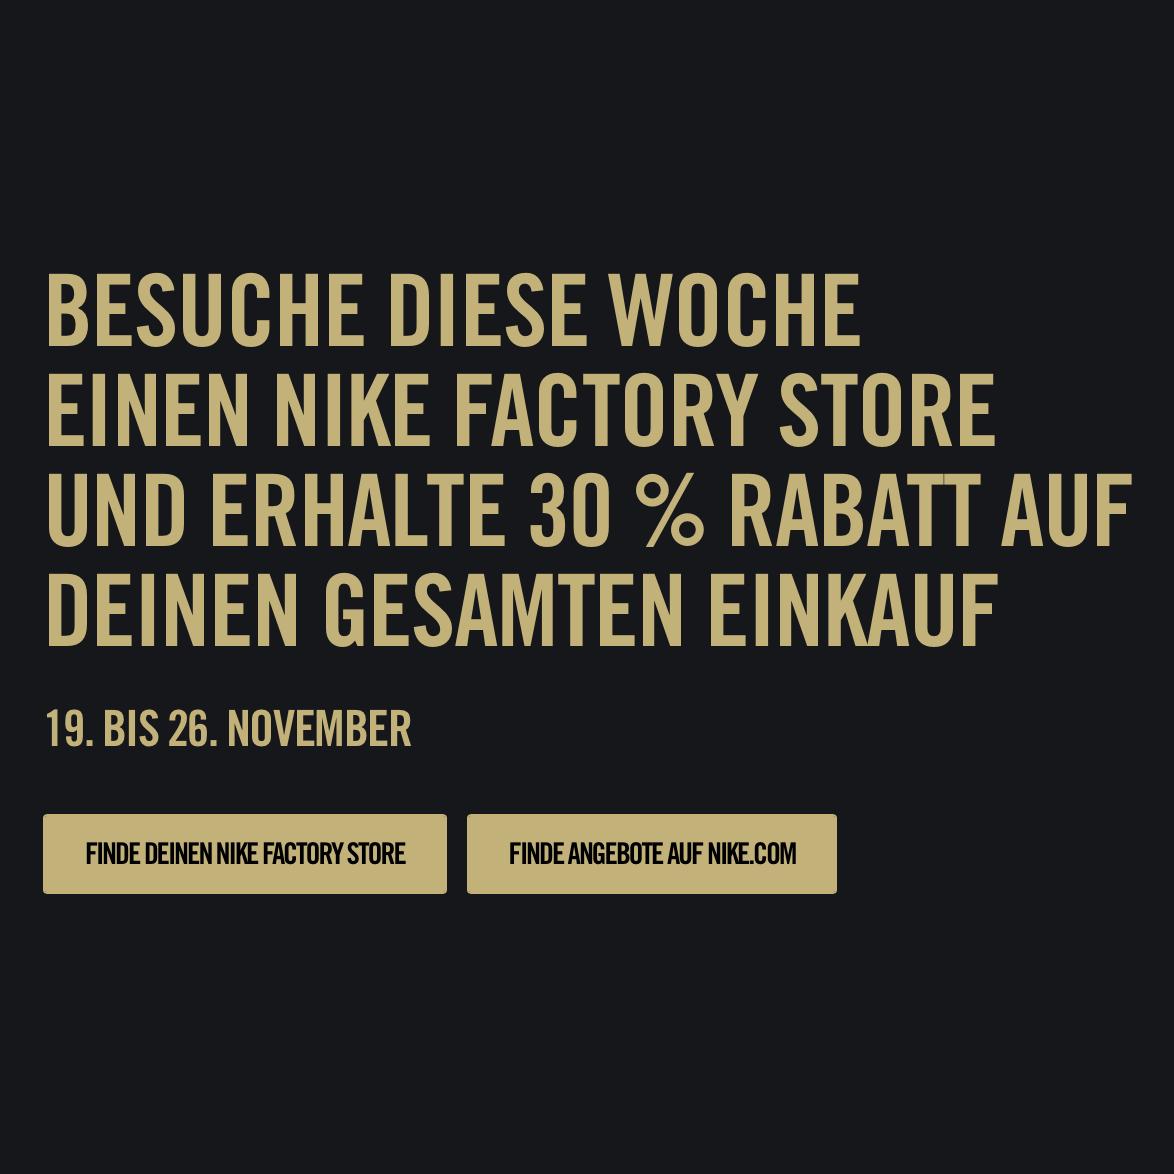 Nike Store Black Friday 2019 » Angebote & Deals - mydealz.de